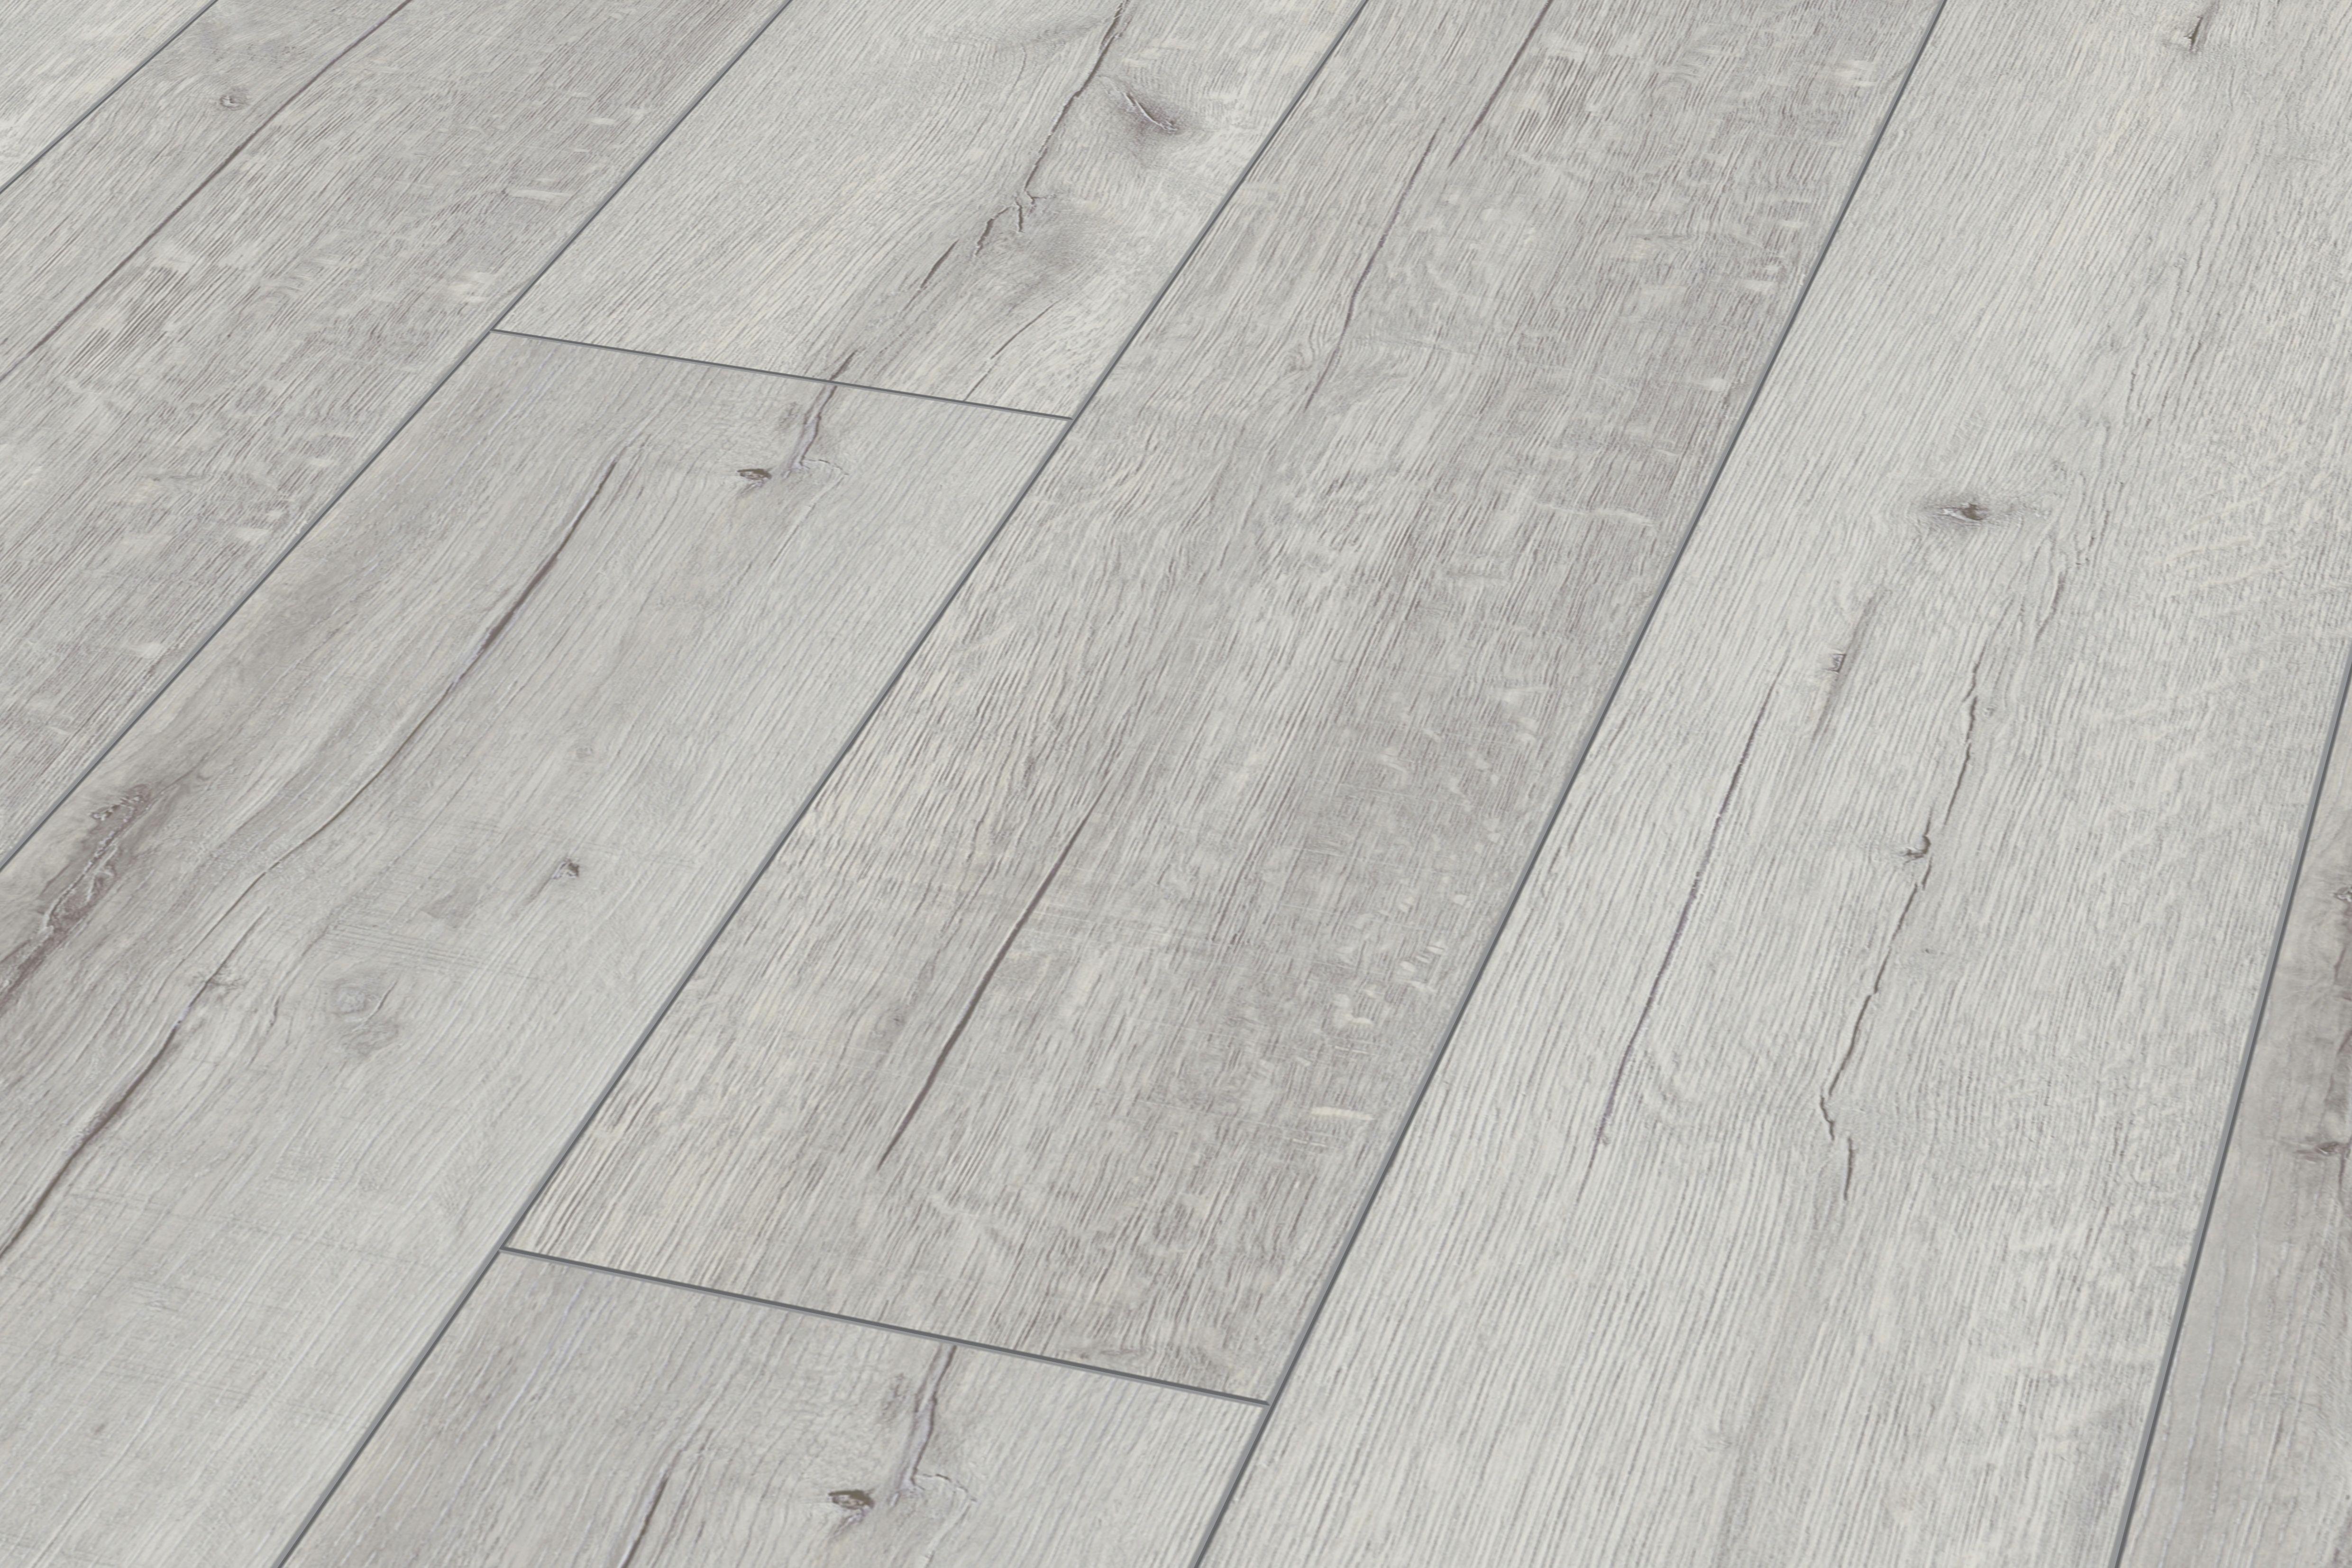 grey and white laminate flooring